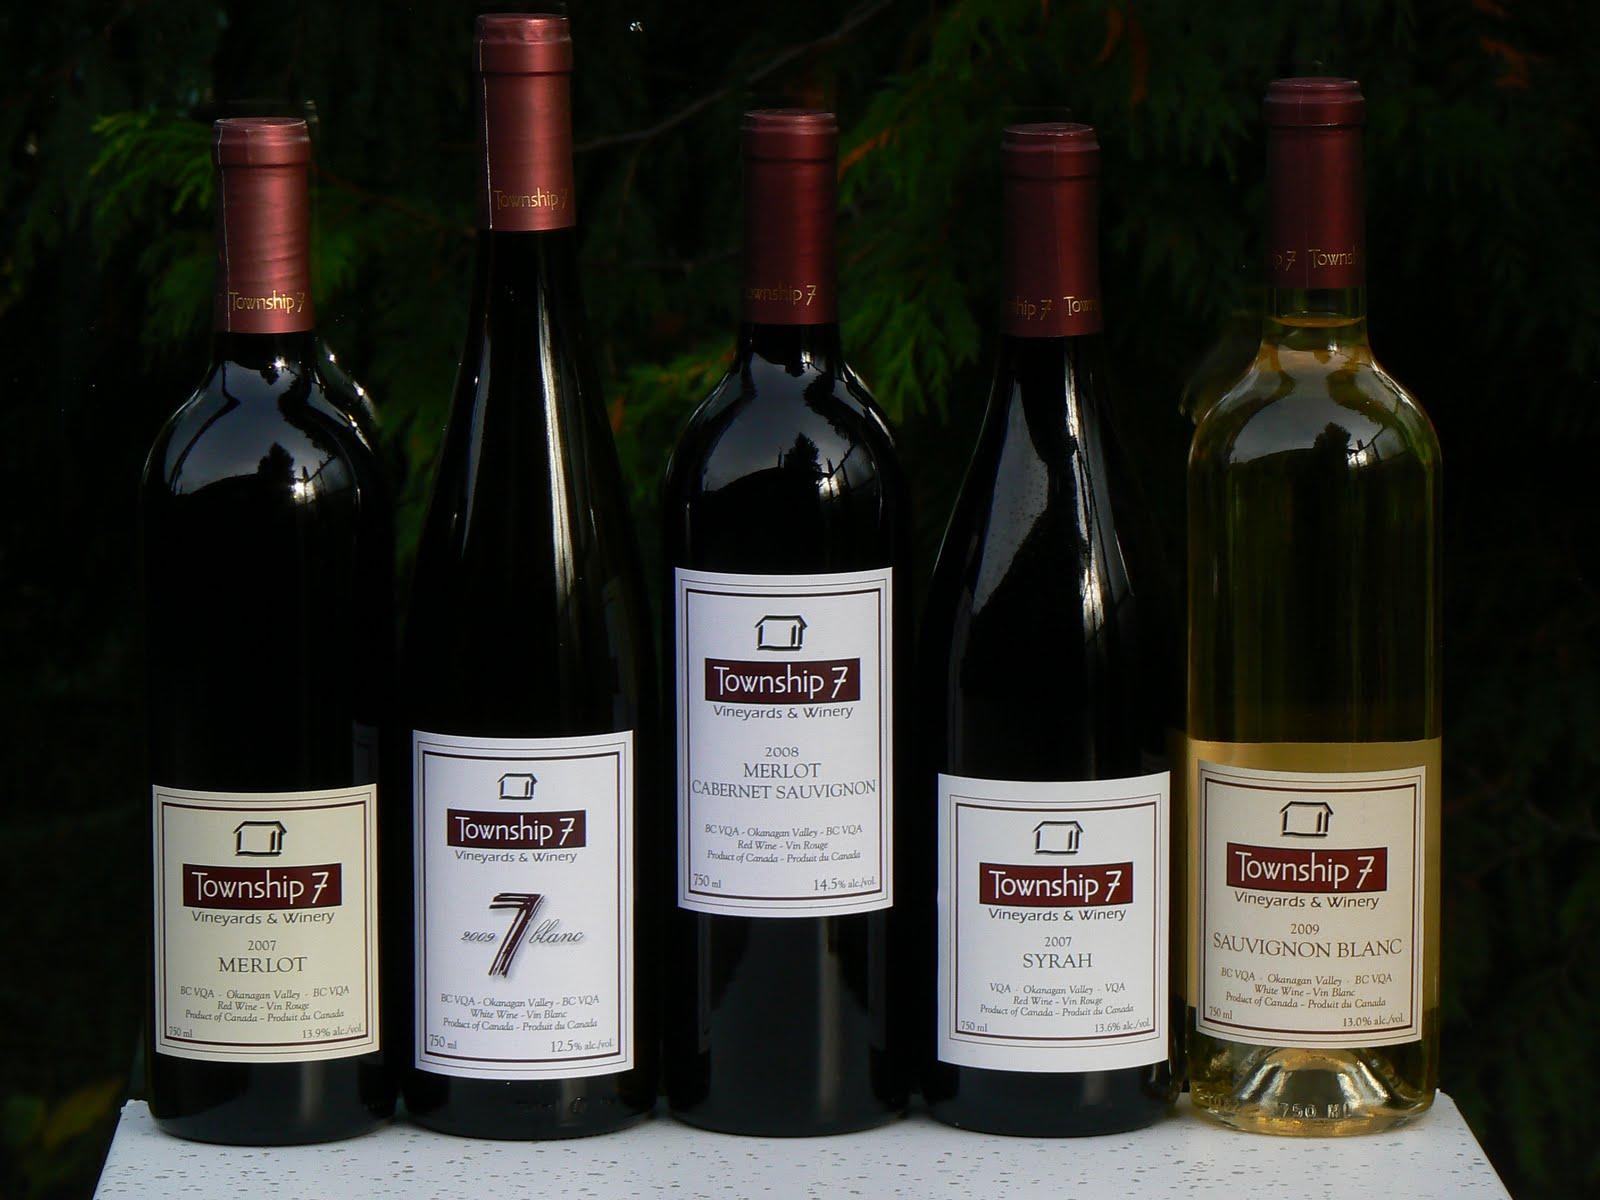 John Schreiner on wine: Township 7 releases a new white blendtownship 7